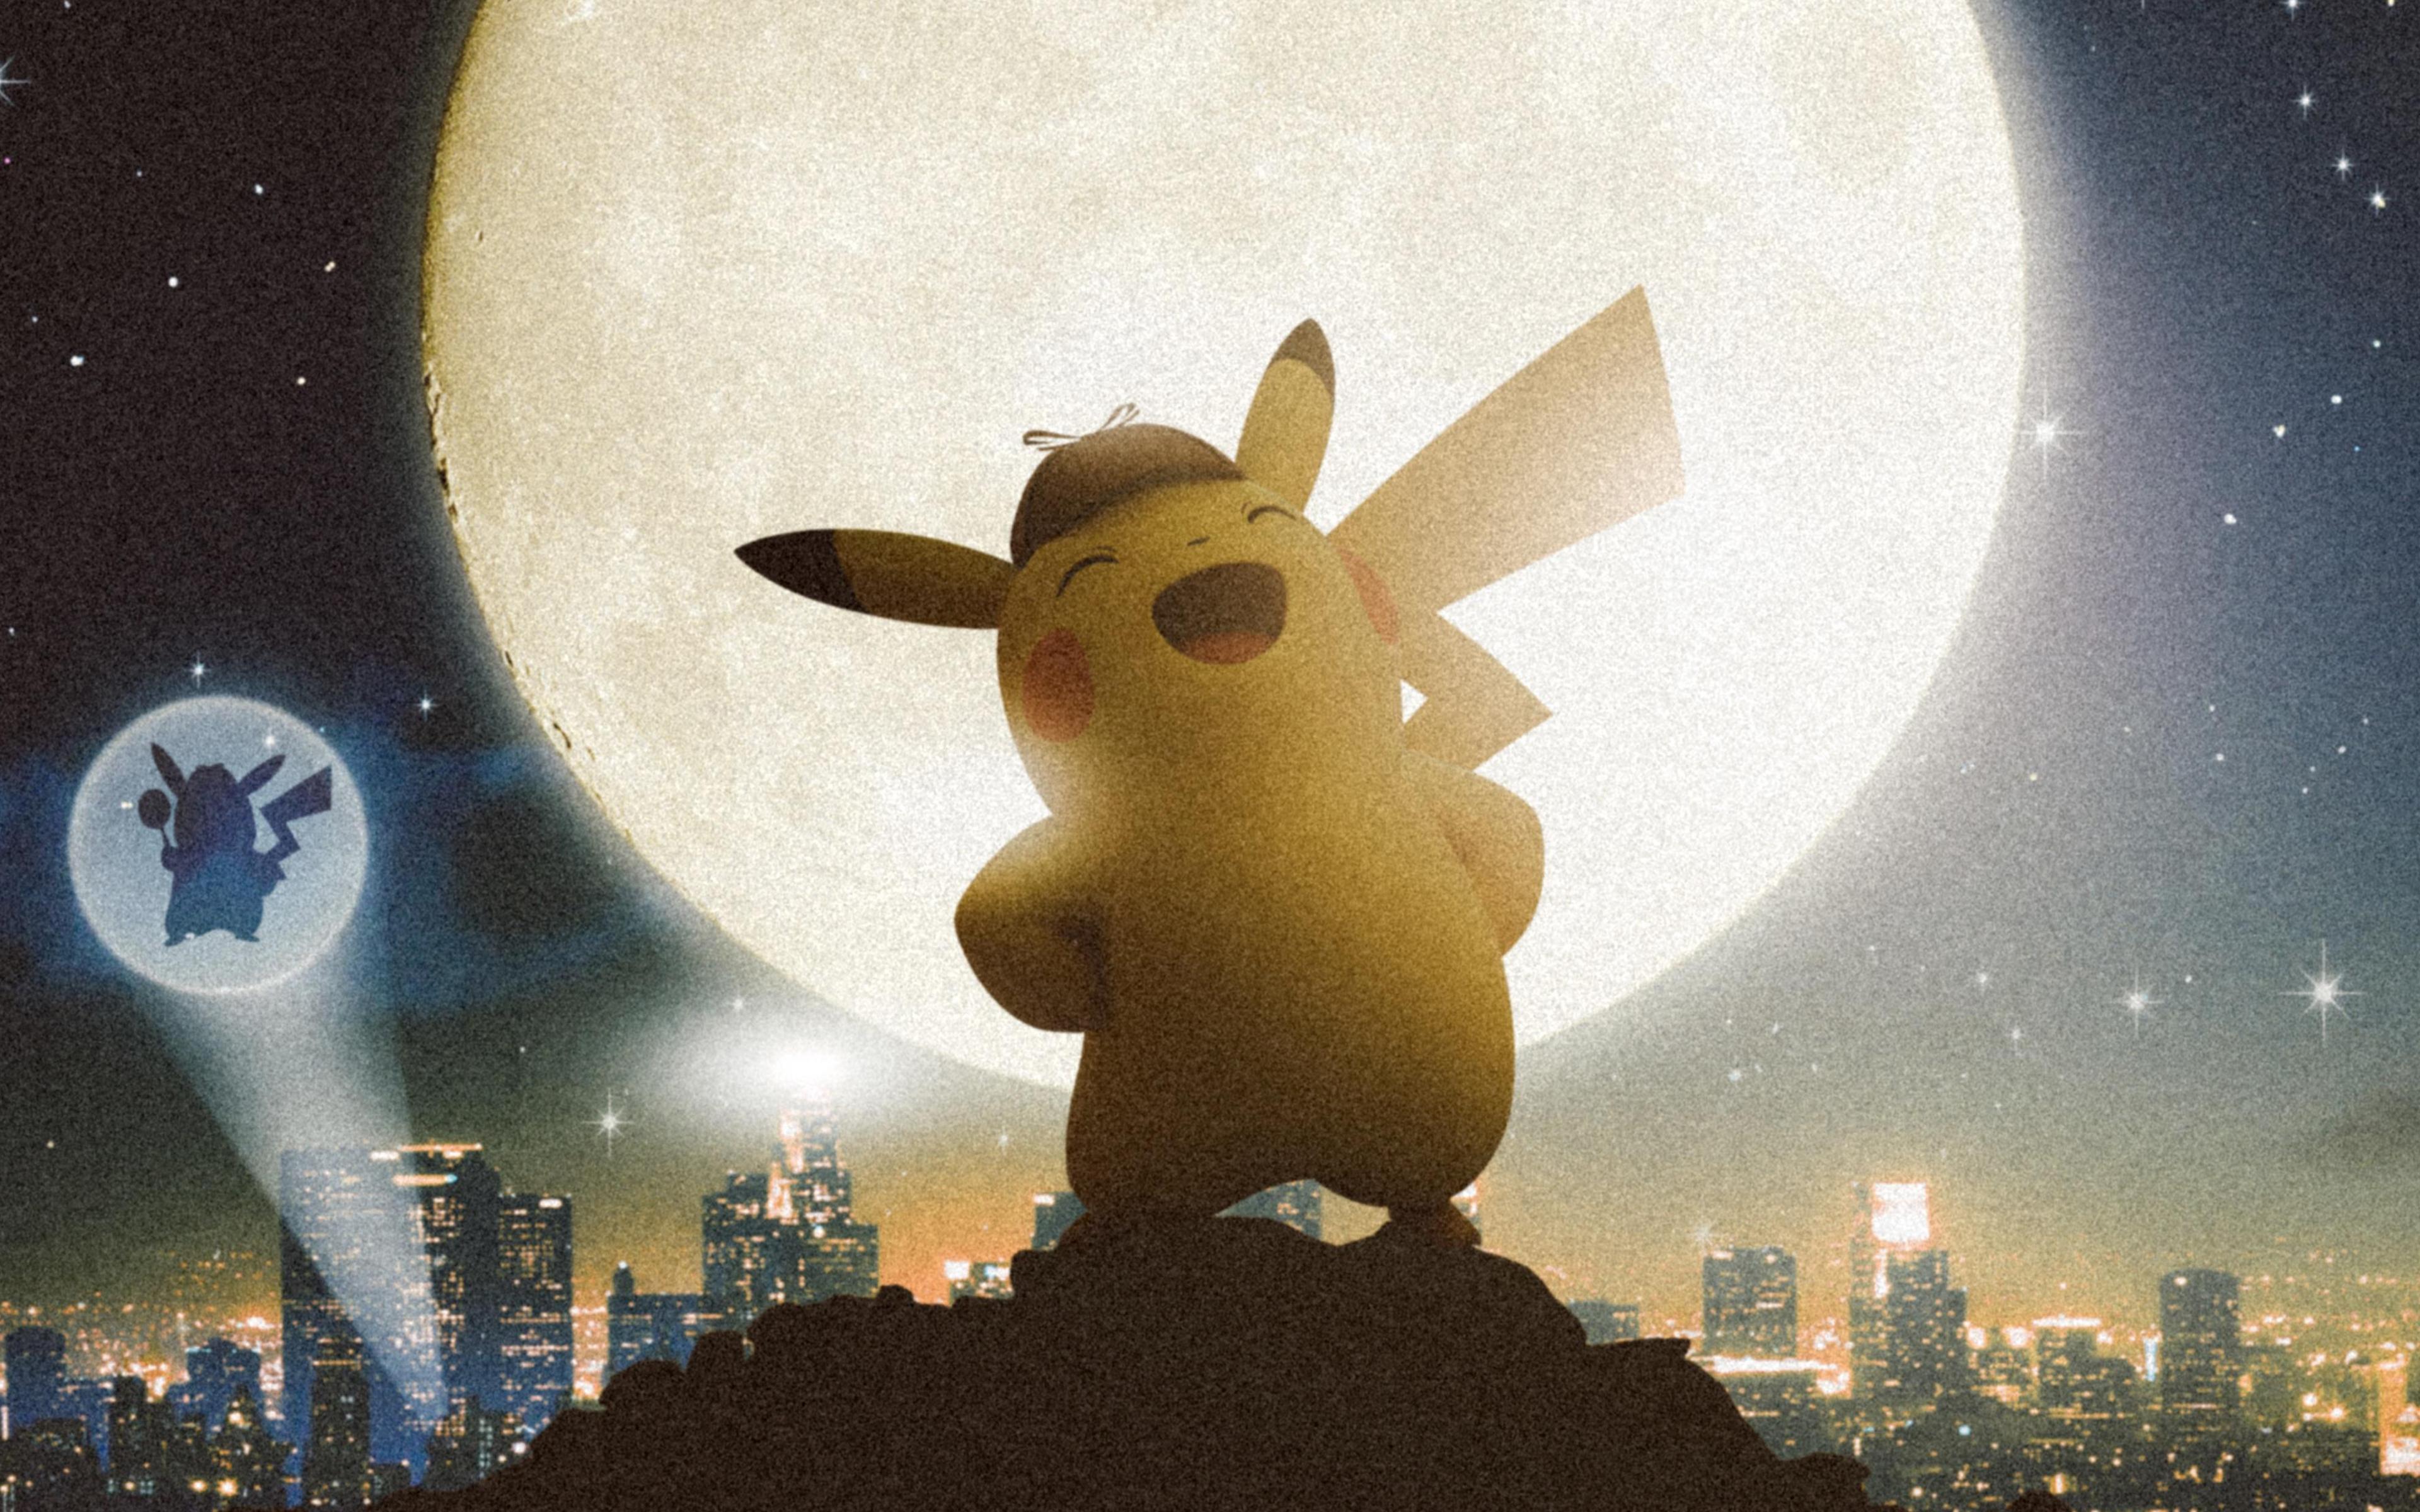 detective-pikachu-8o.jpg